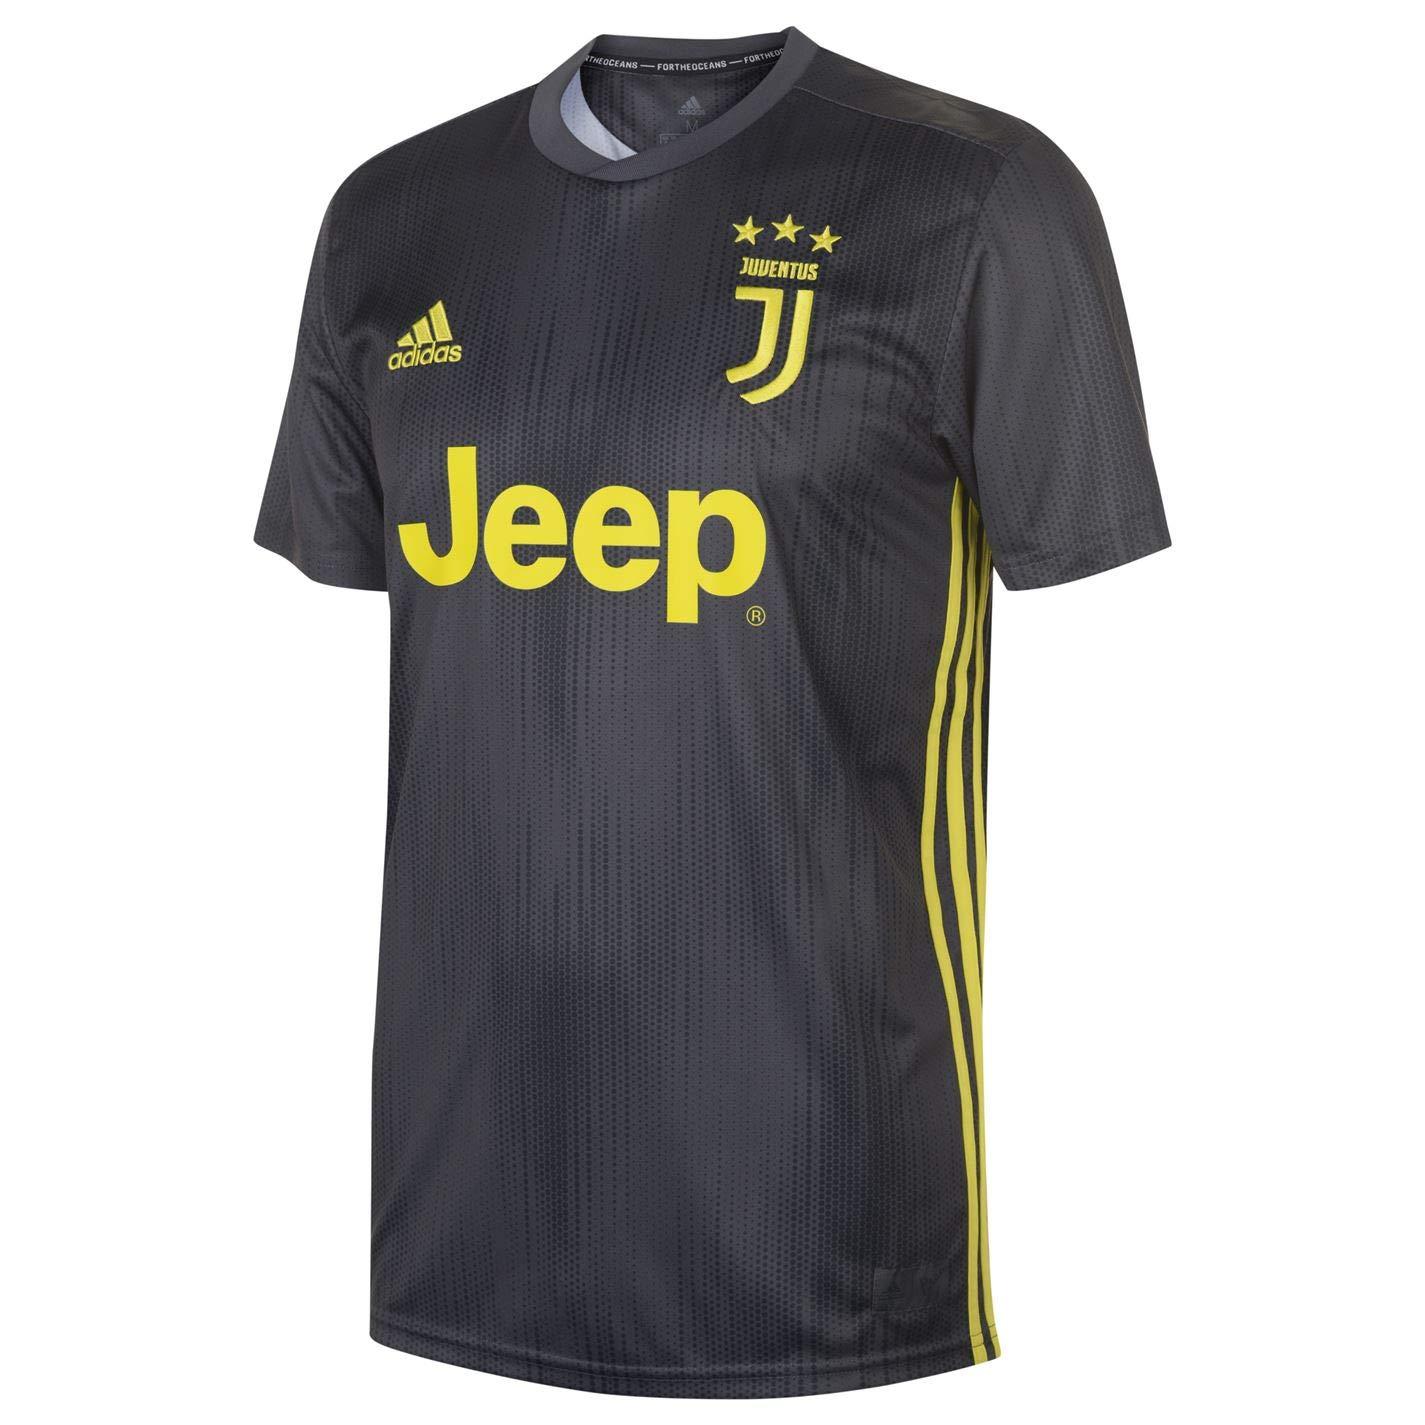 Adidas Herren Juve 3 T-Shirt